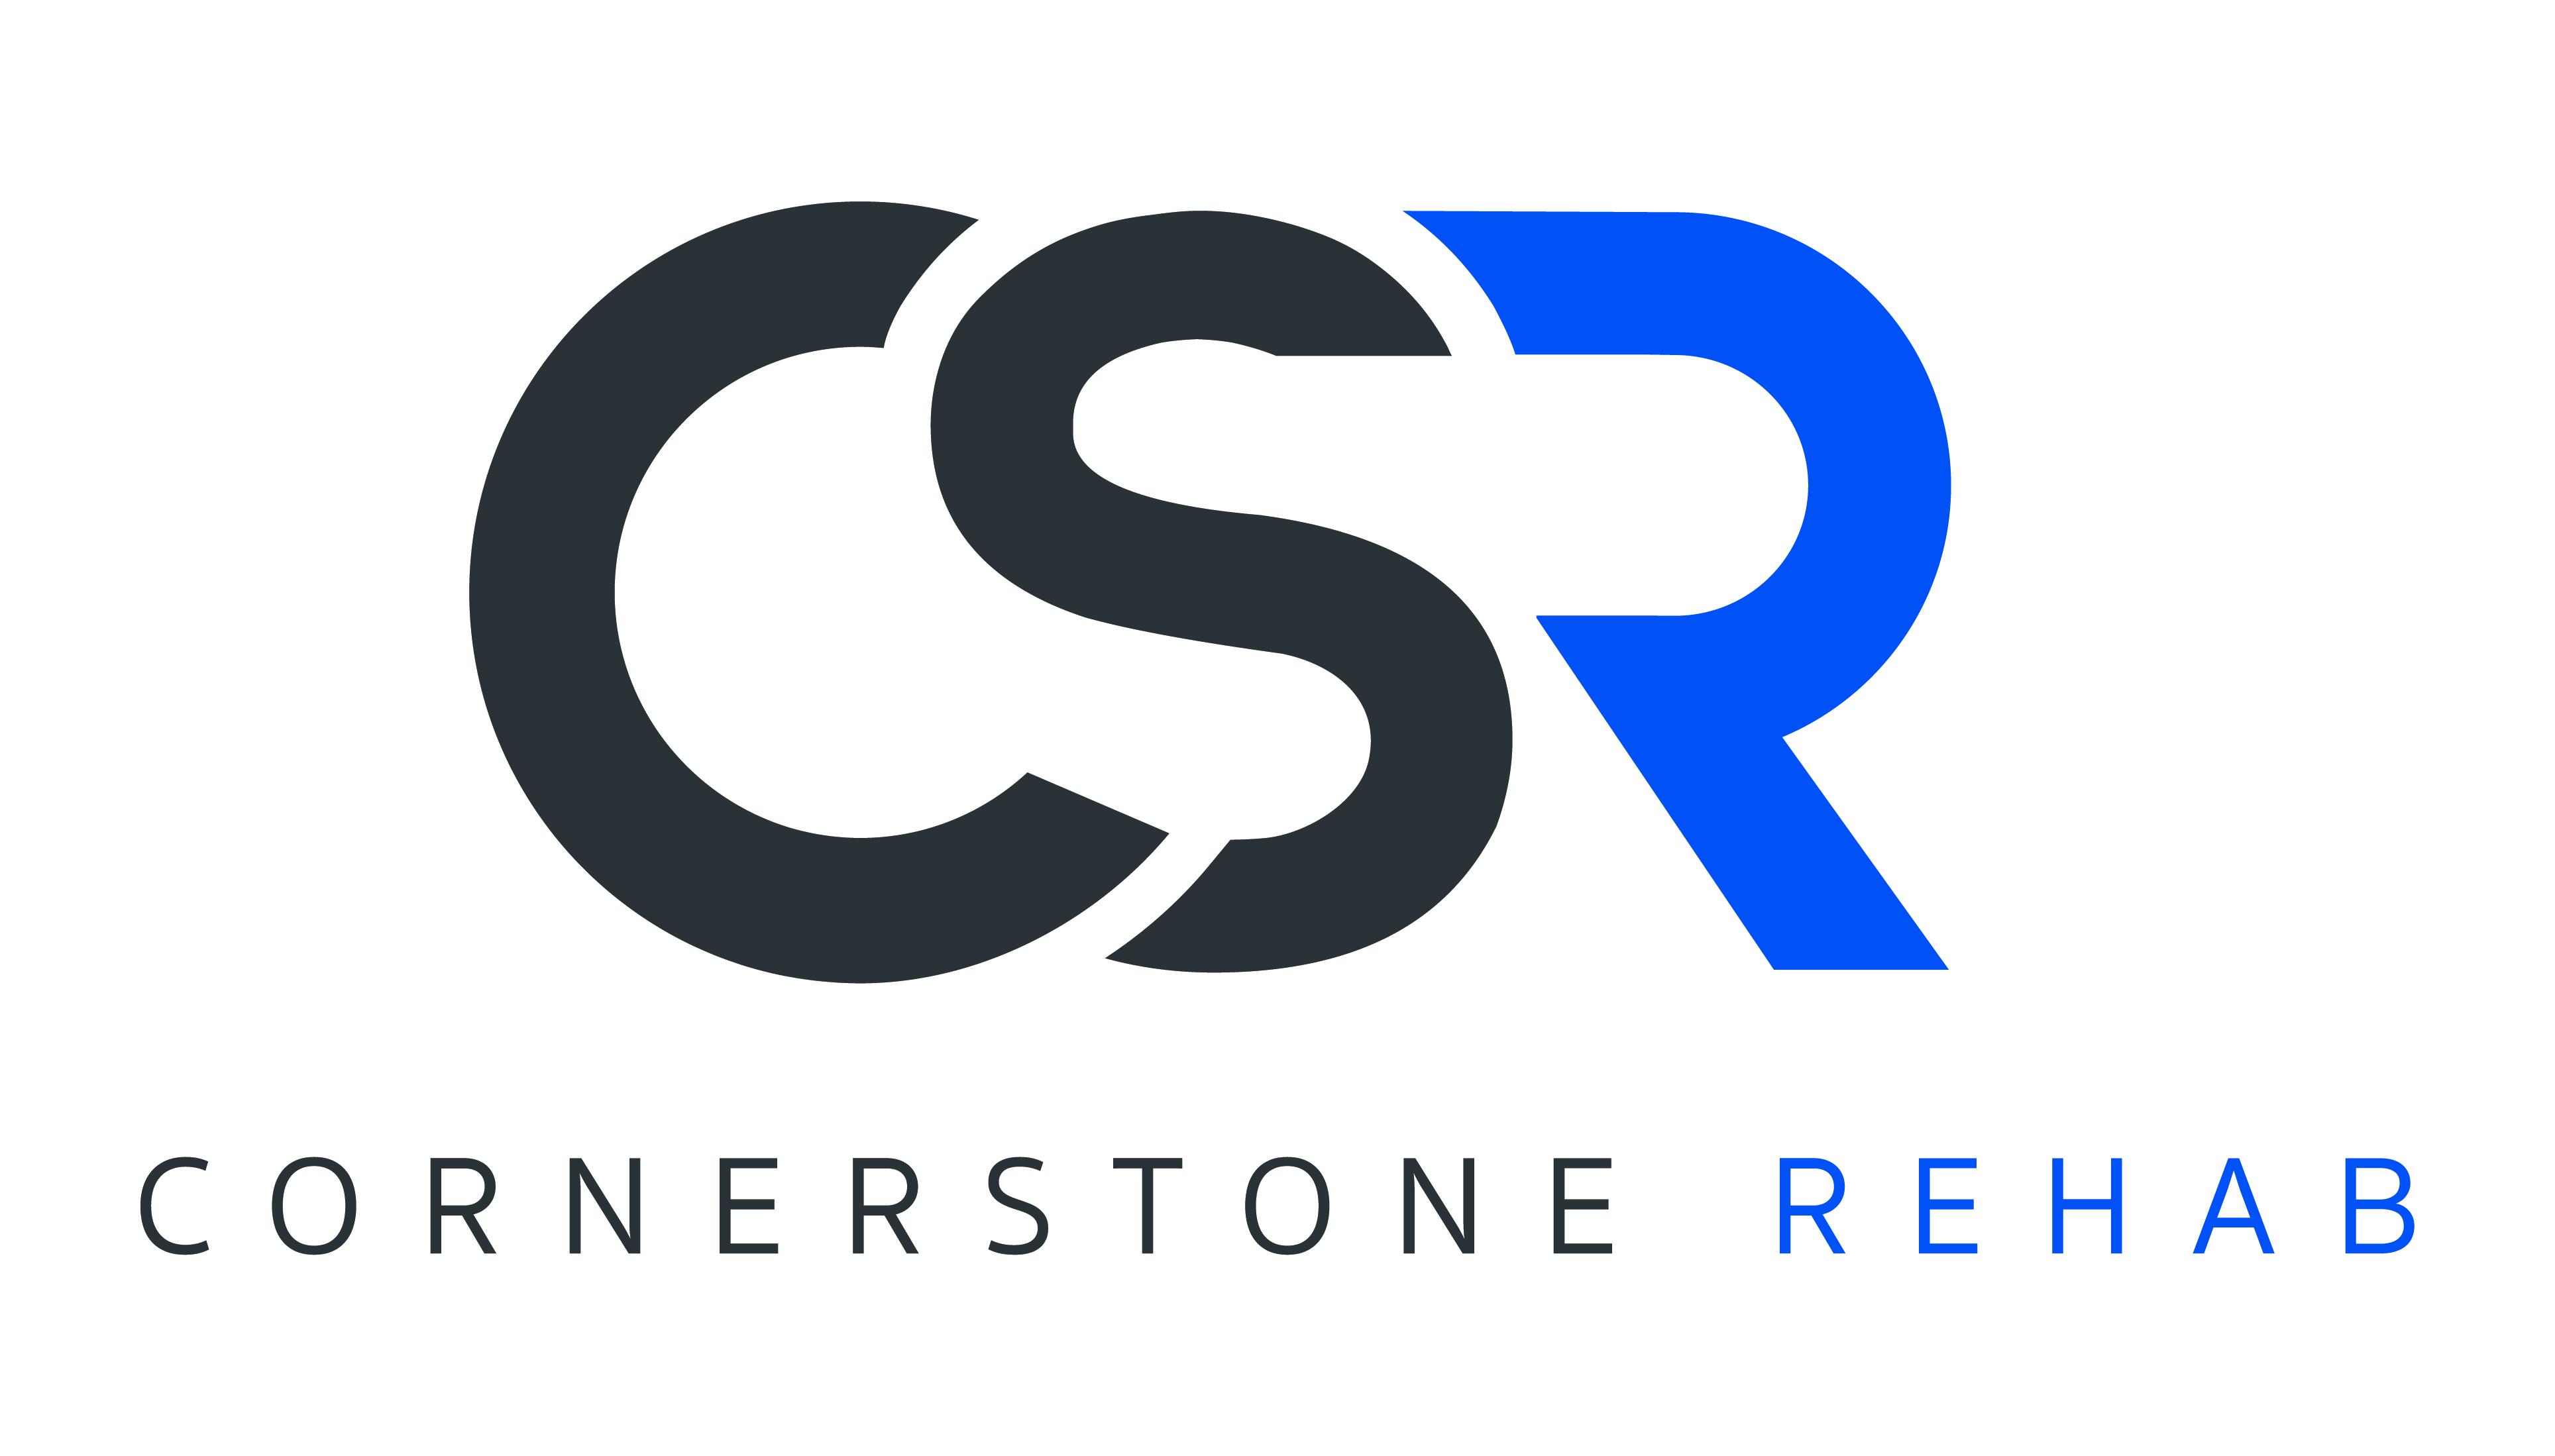 Cornerstone Rehab